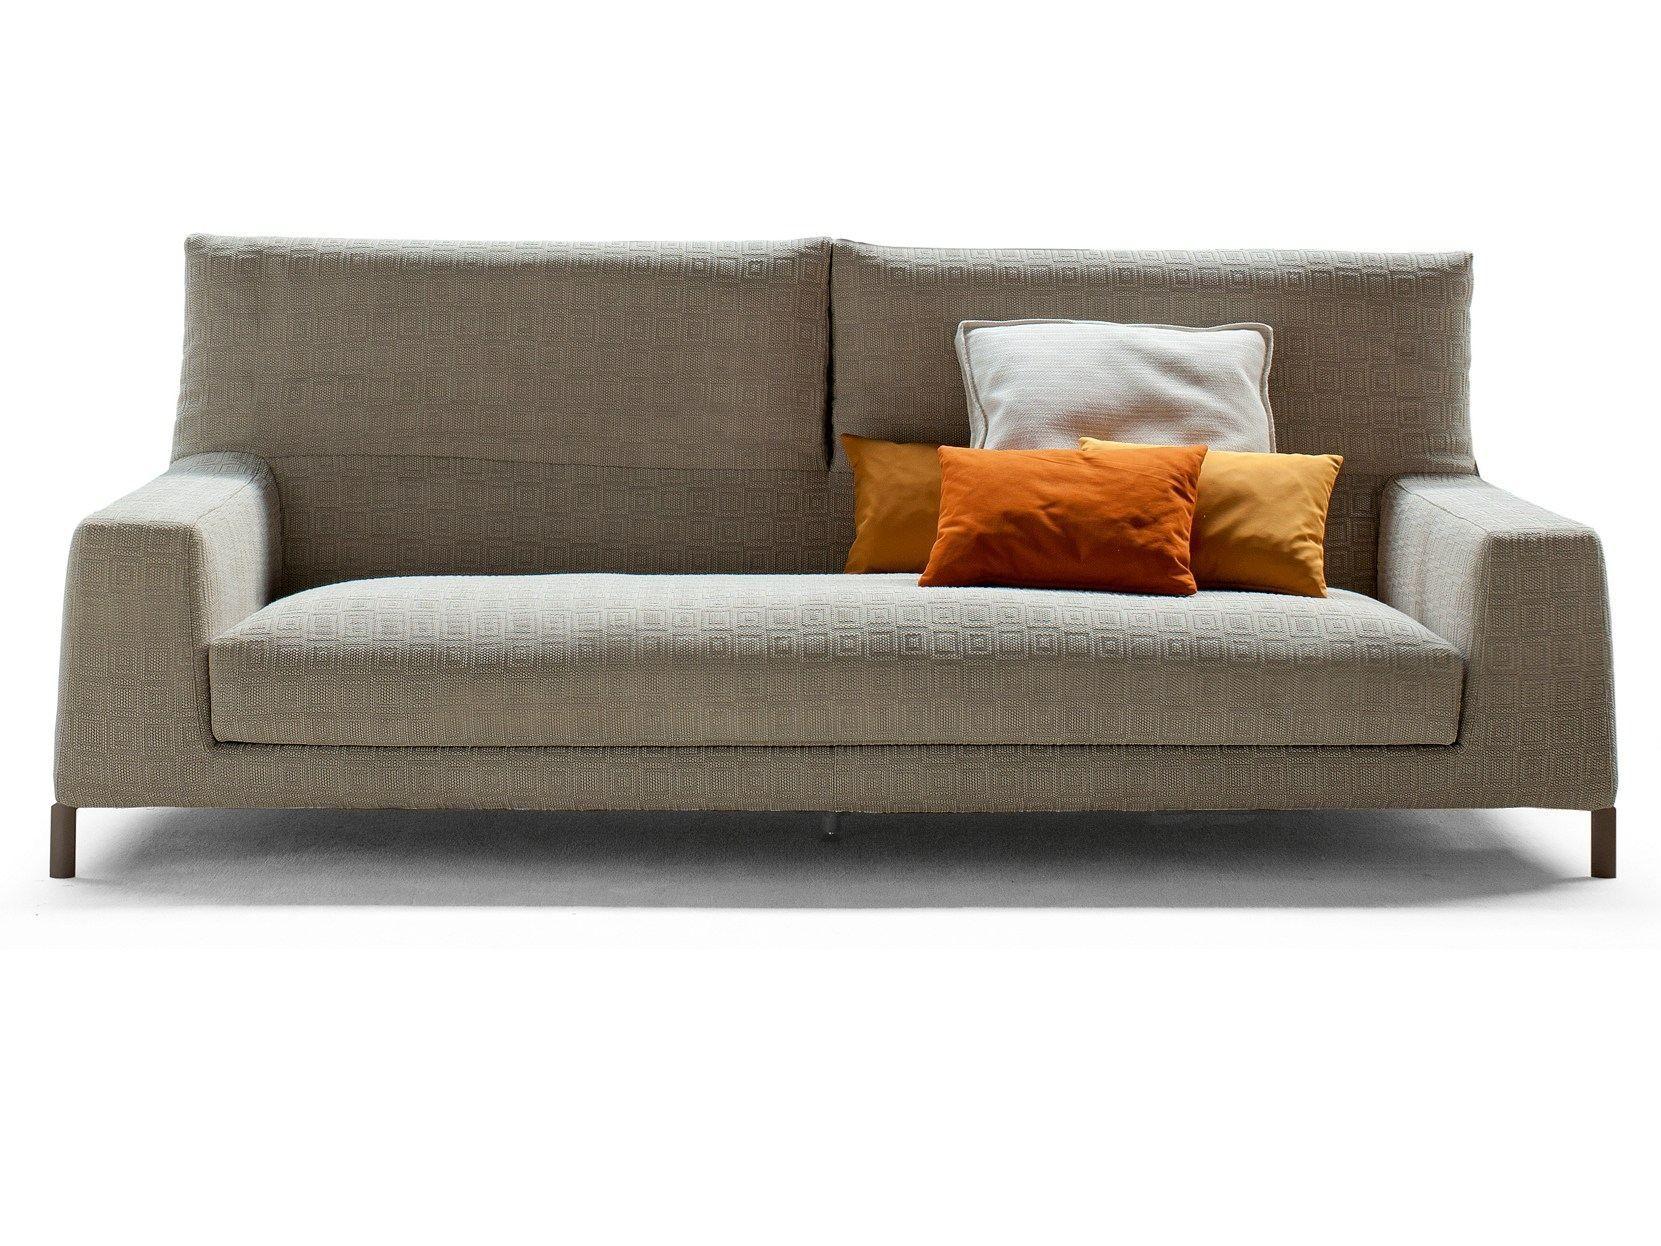 canap convertible avec repose t te vita by bonaldo design mauro lipparini. Black Bedroom Furniture Sets. Home Design Ideas